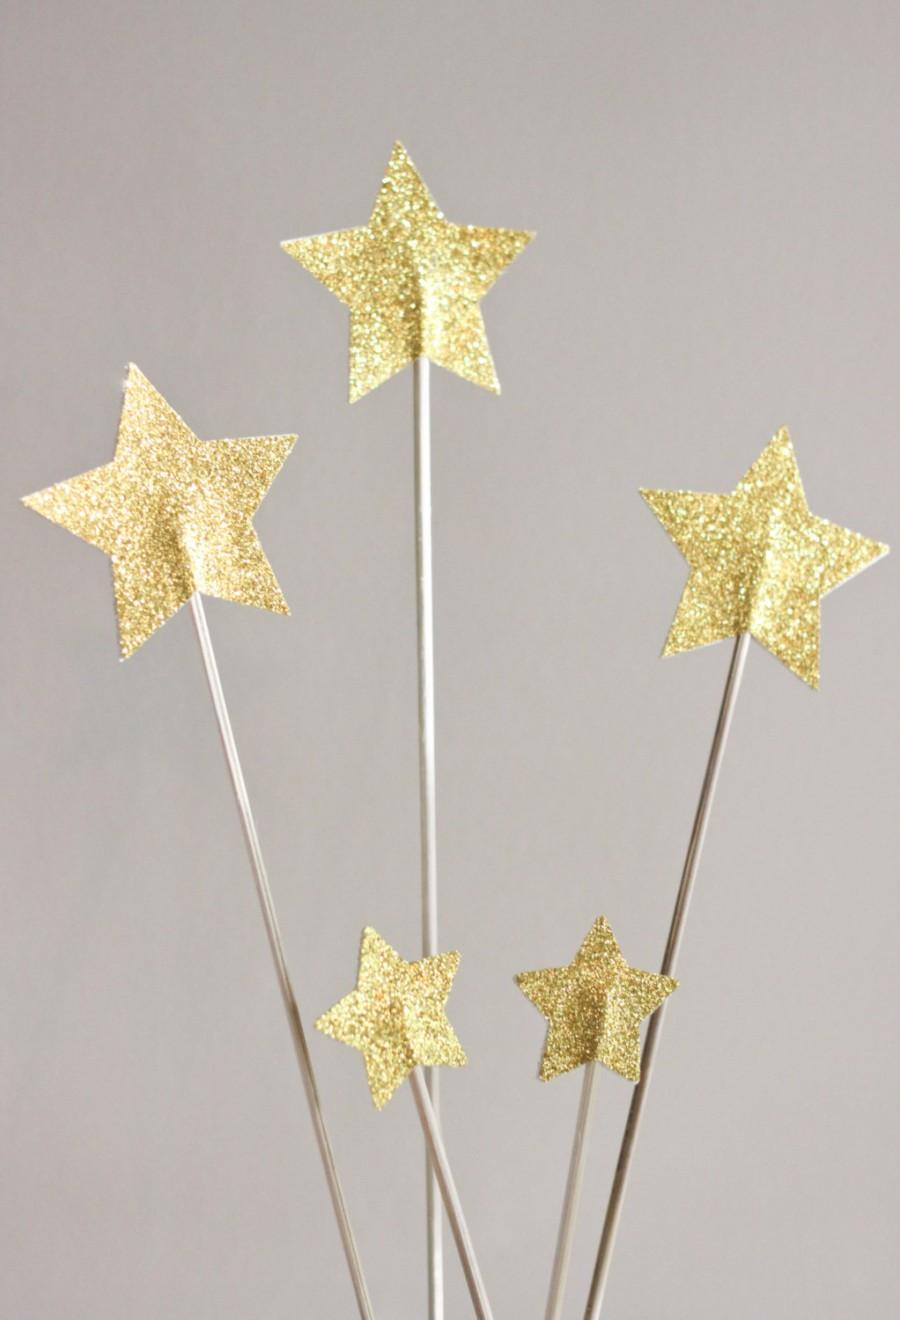 Mariage - Gold Star Cake Topper Set - Gold Glitter Star